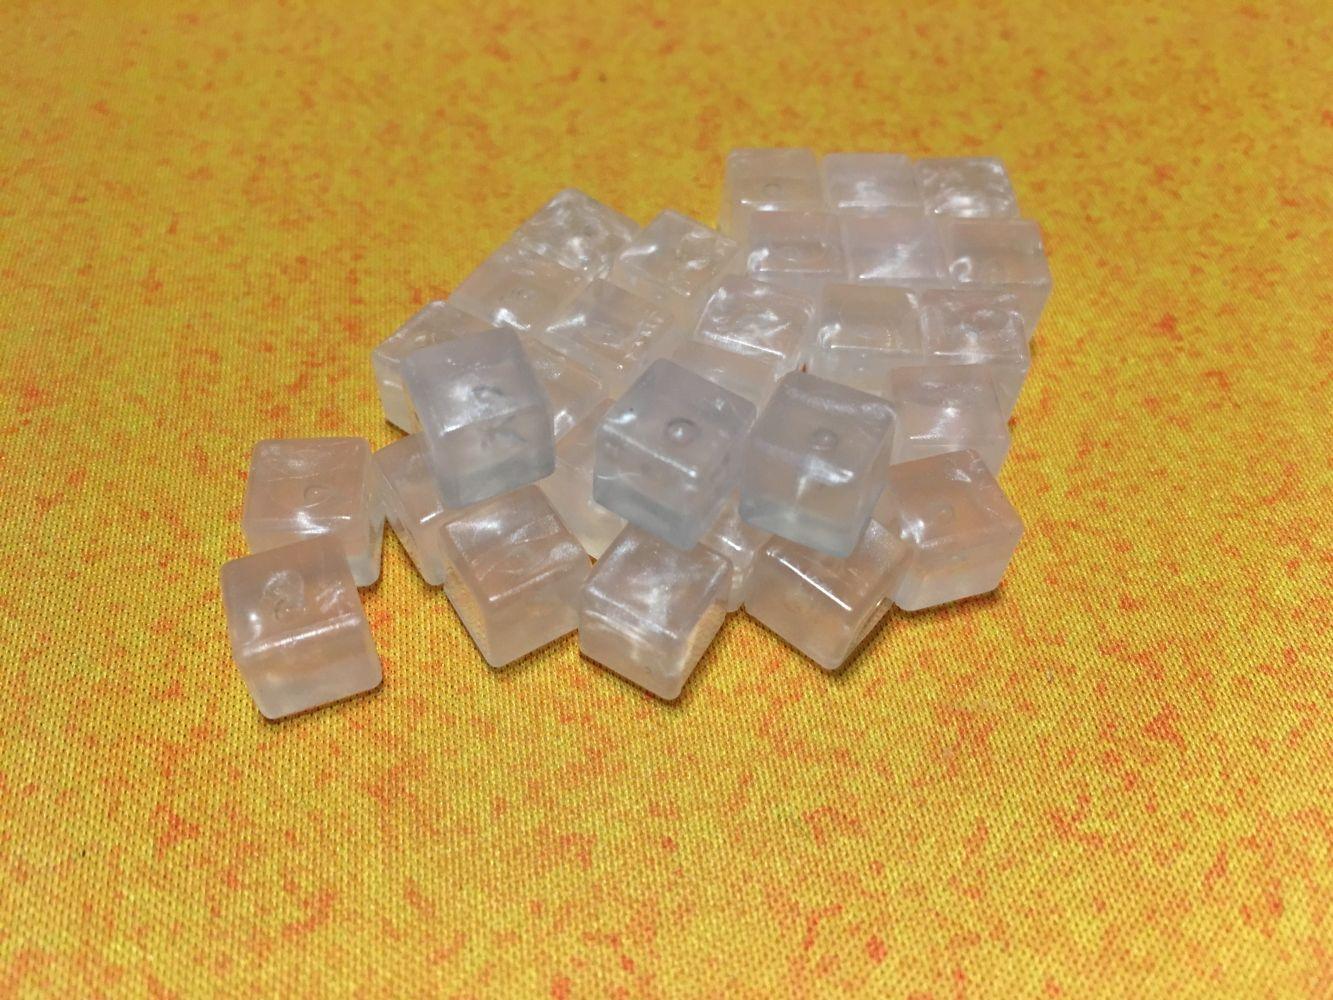 Les cubes ingénieuries